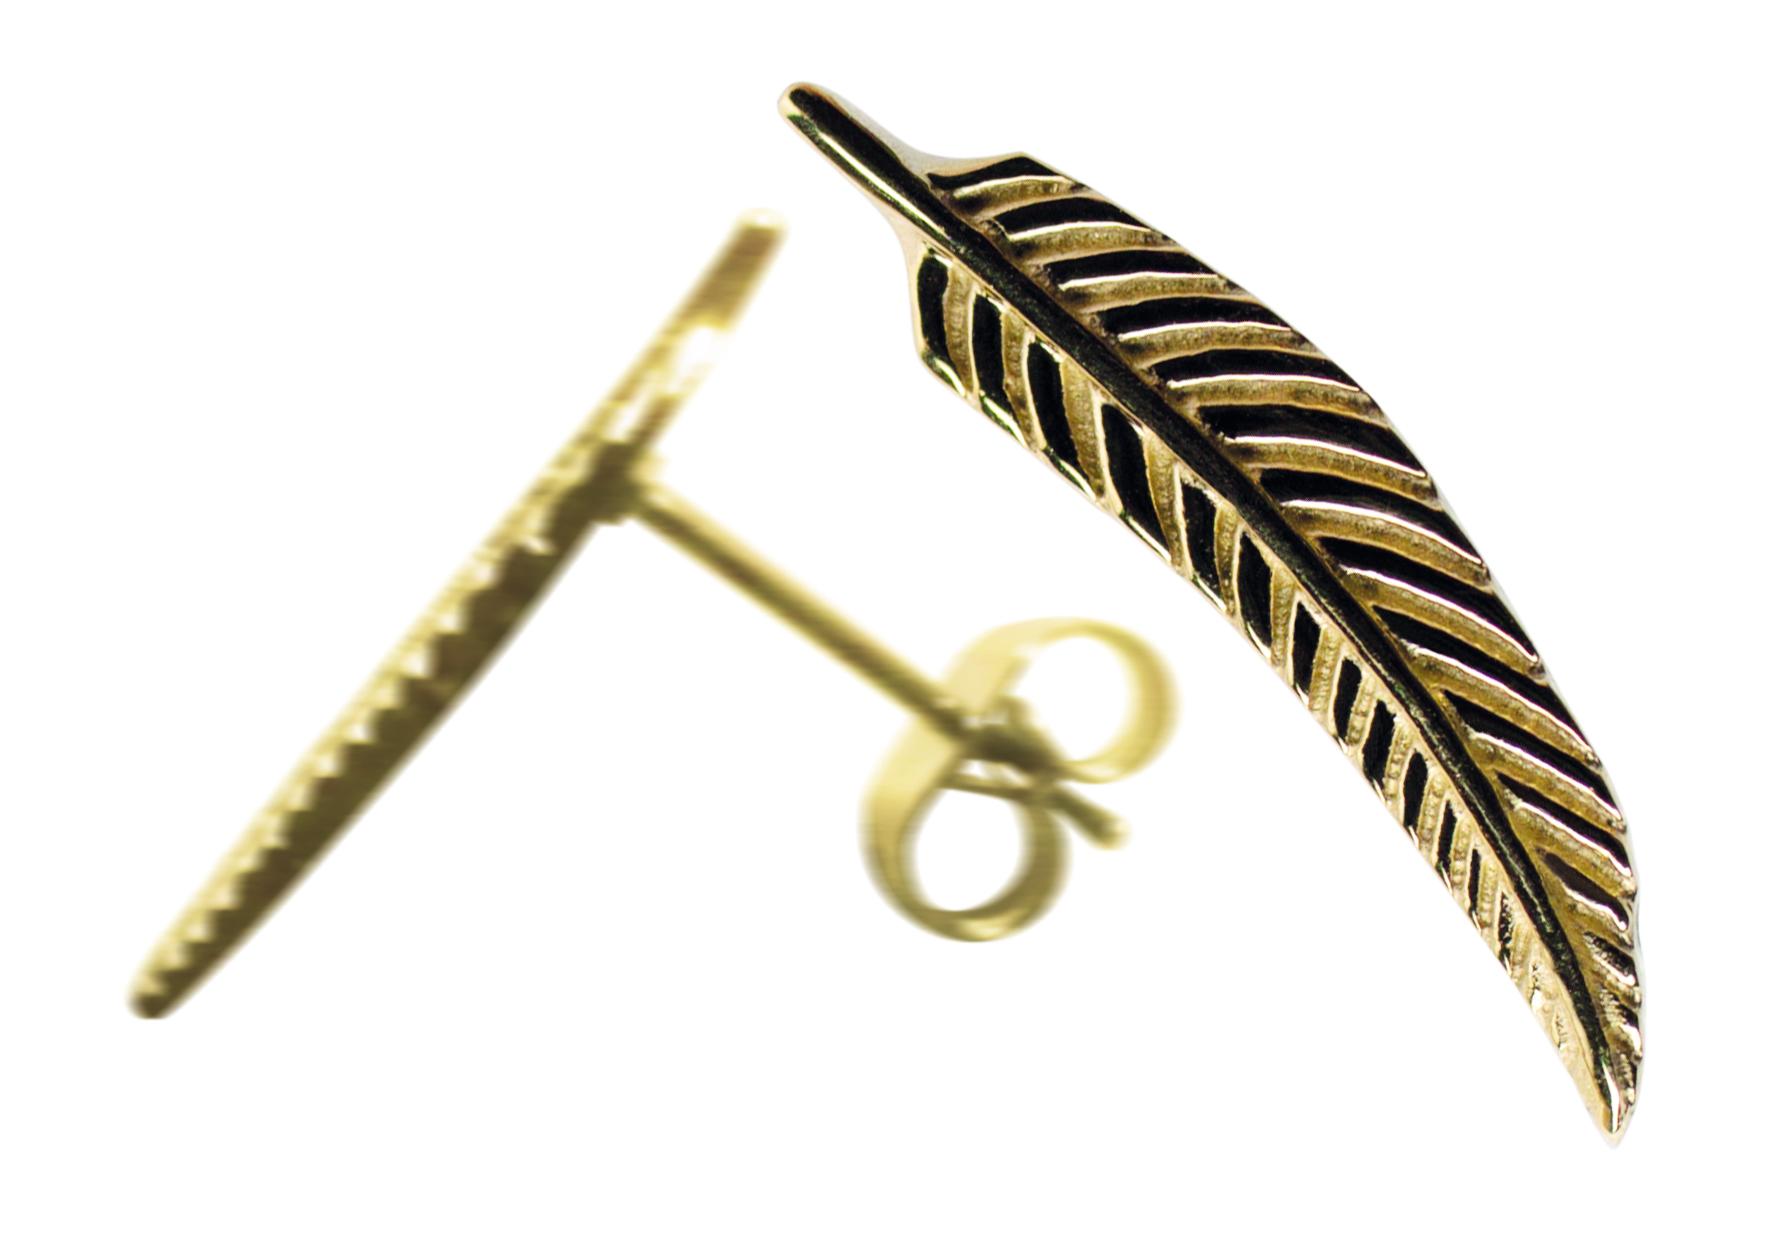 2 Traumfänger Feder Ohrring (Ohrstecker) gold